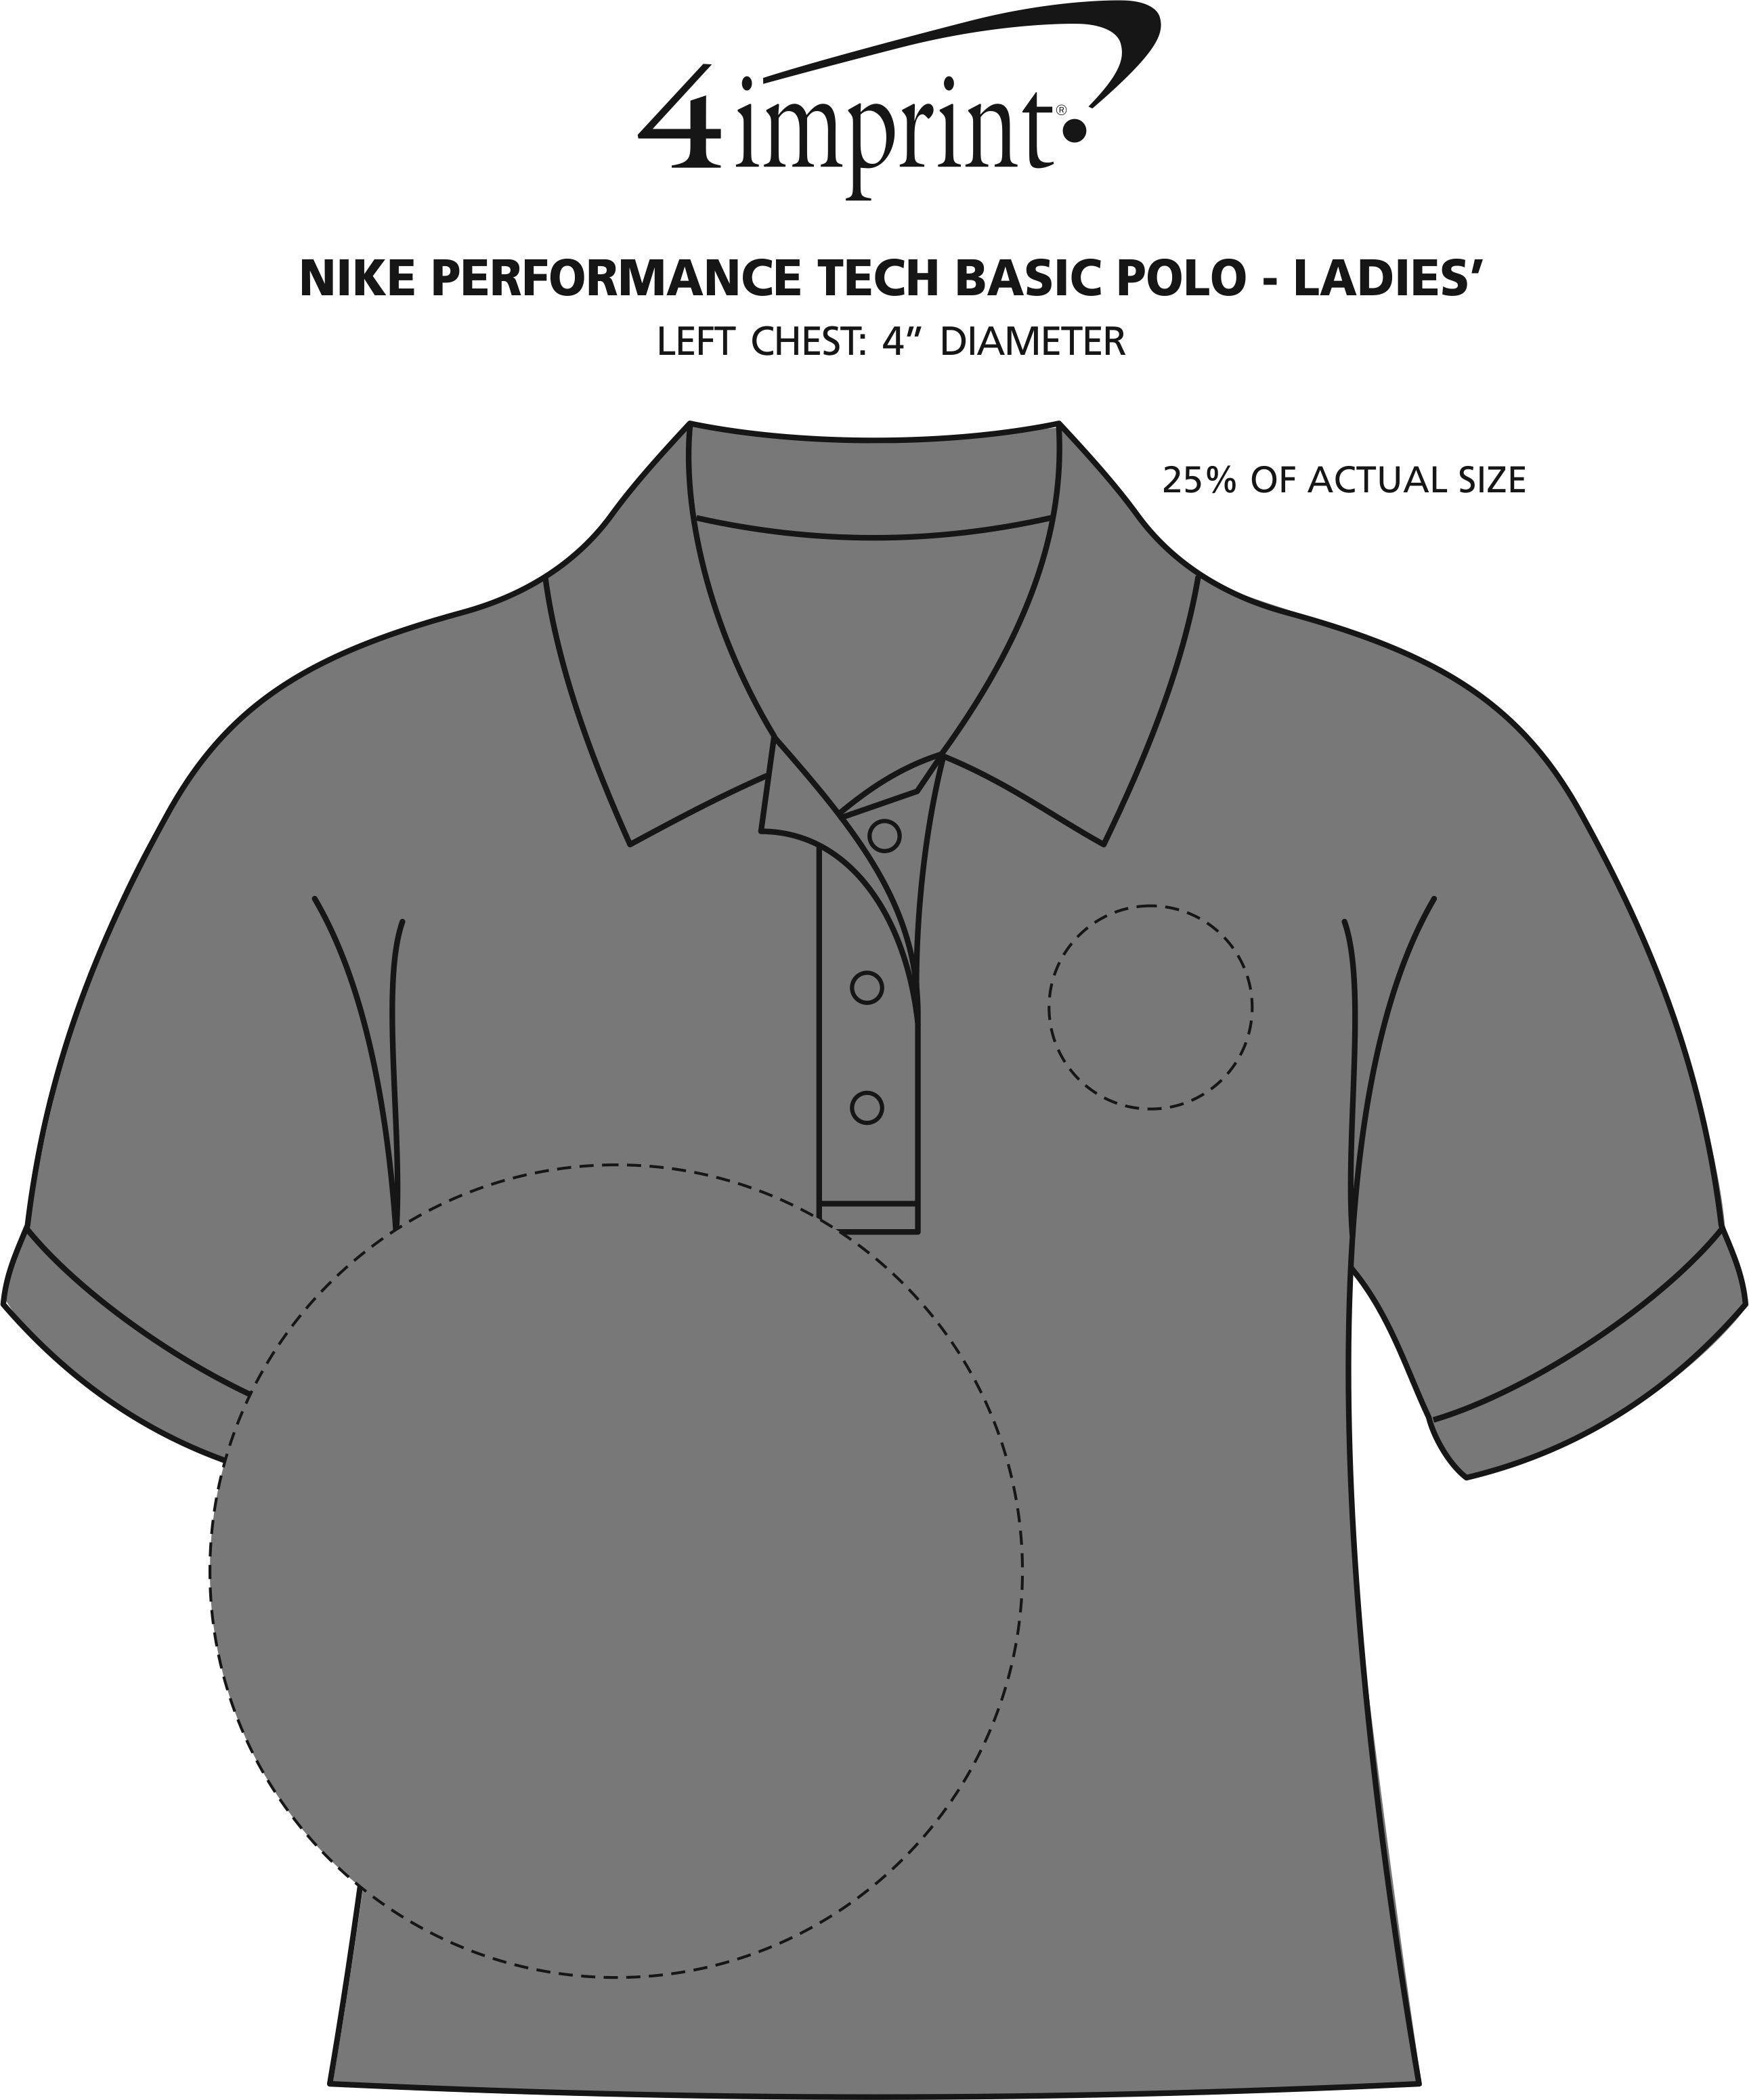 Imprint Area of Nike Performance Tech Basic Polo - Ladies'